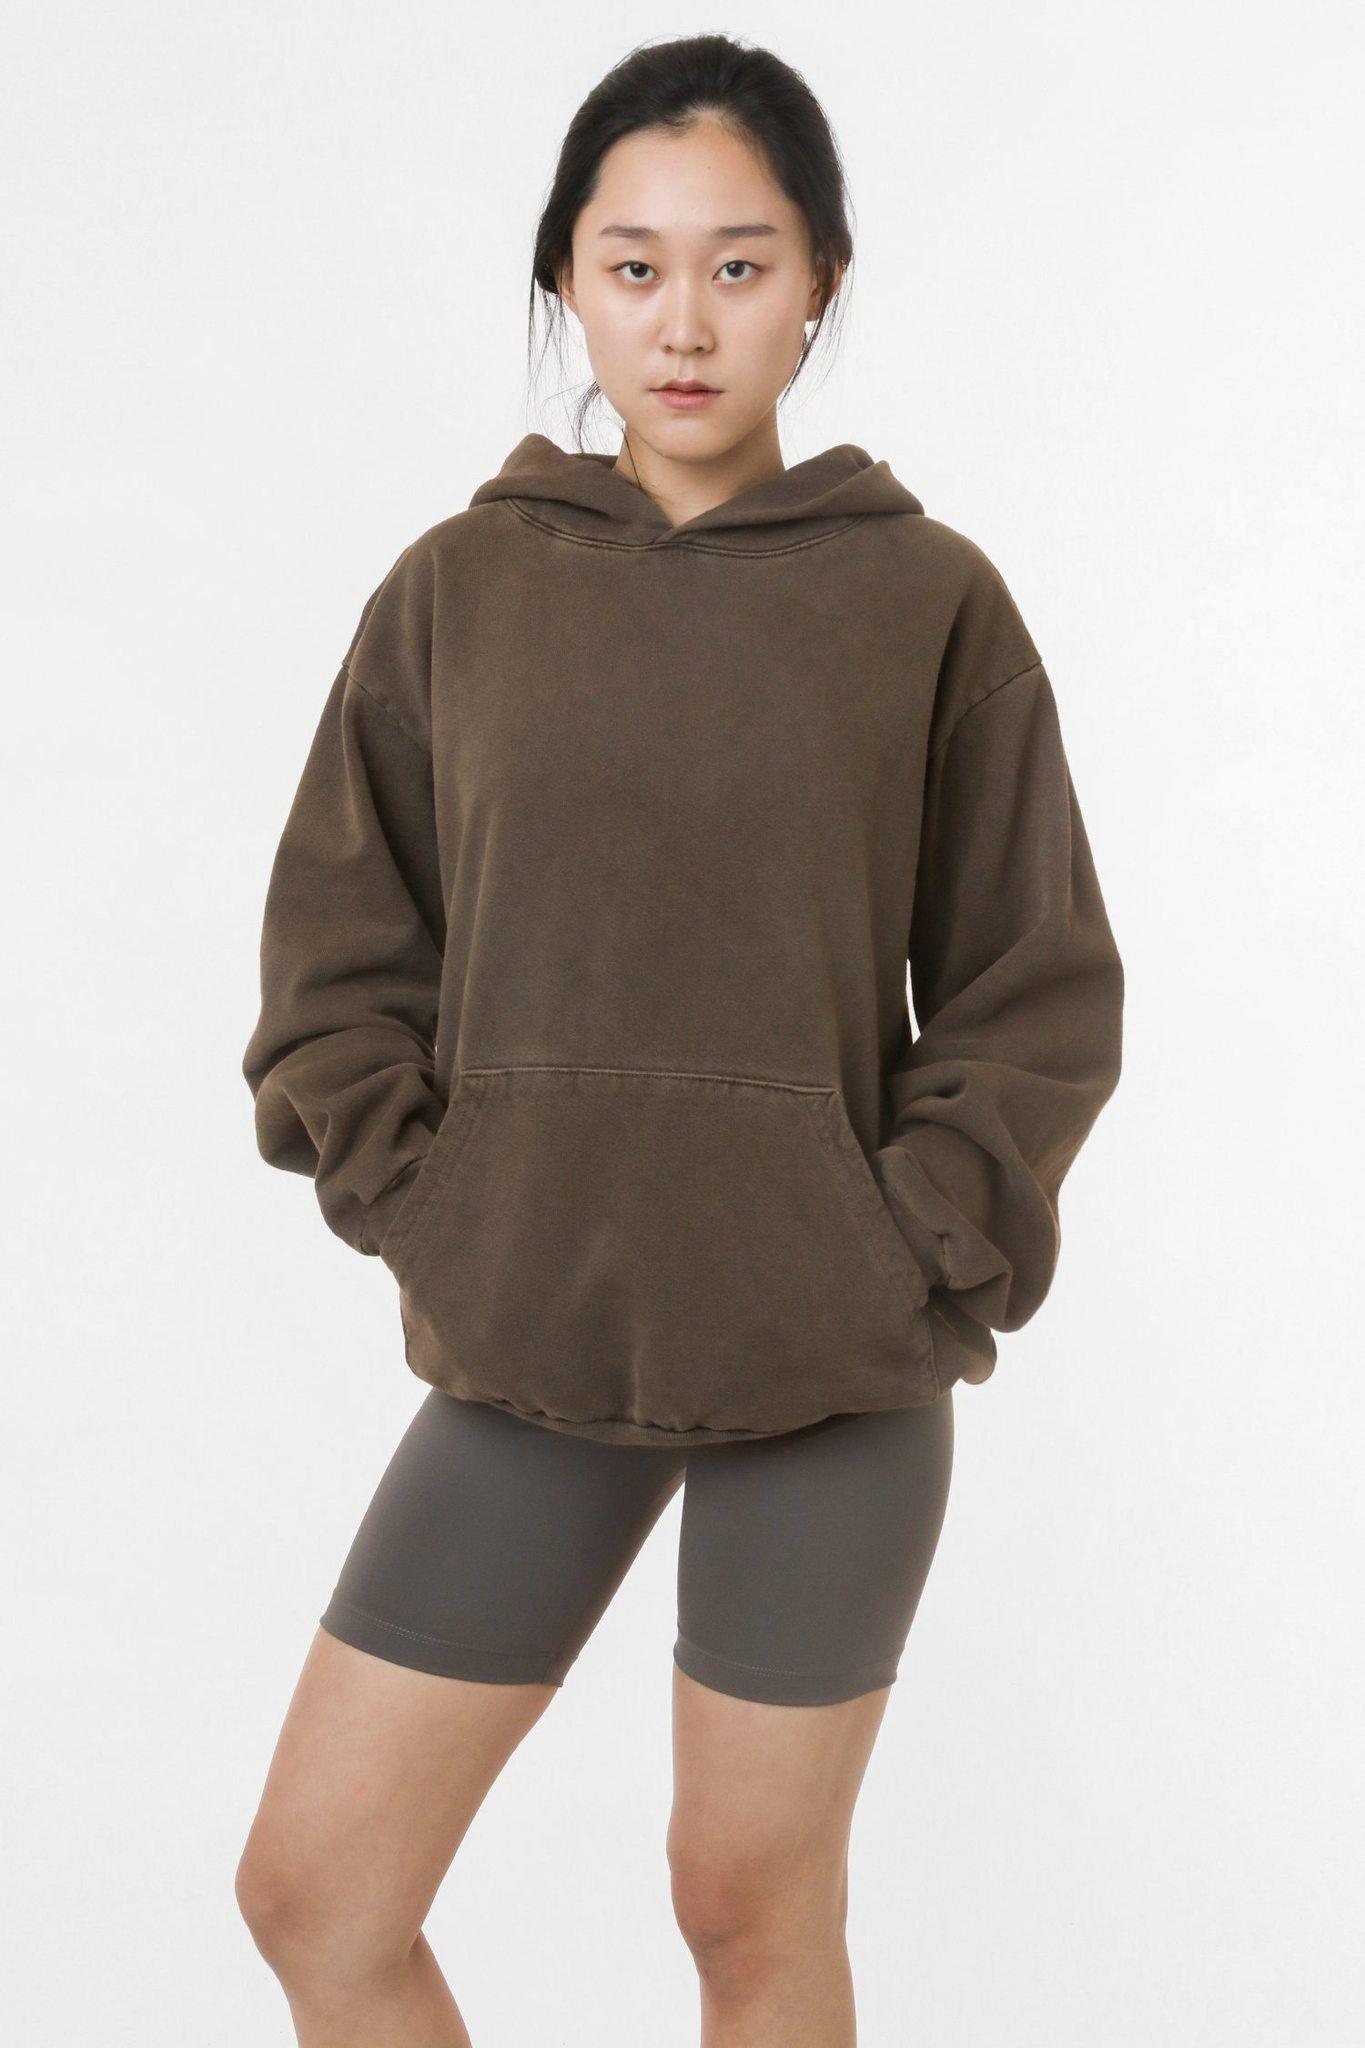 Hf14gd Unisex Pigment Dye Heavy Fleece Tee In 2020 Hooded Pullover Sweaters And Leggings Fleece Hooded Sweatshirt